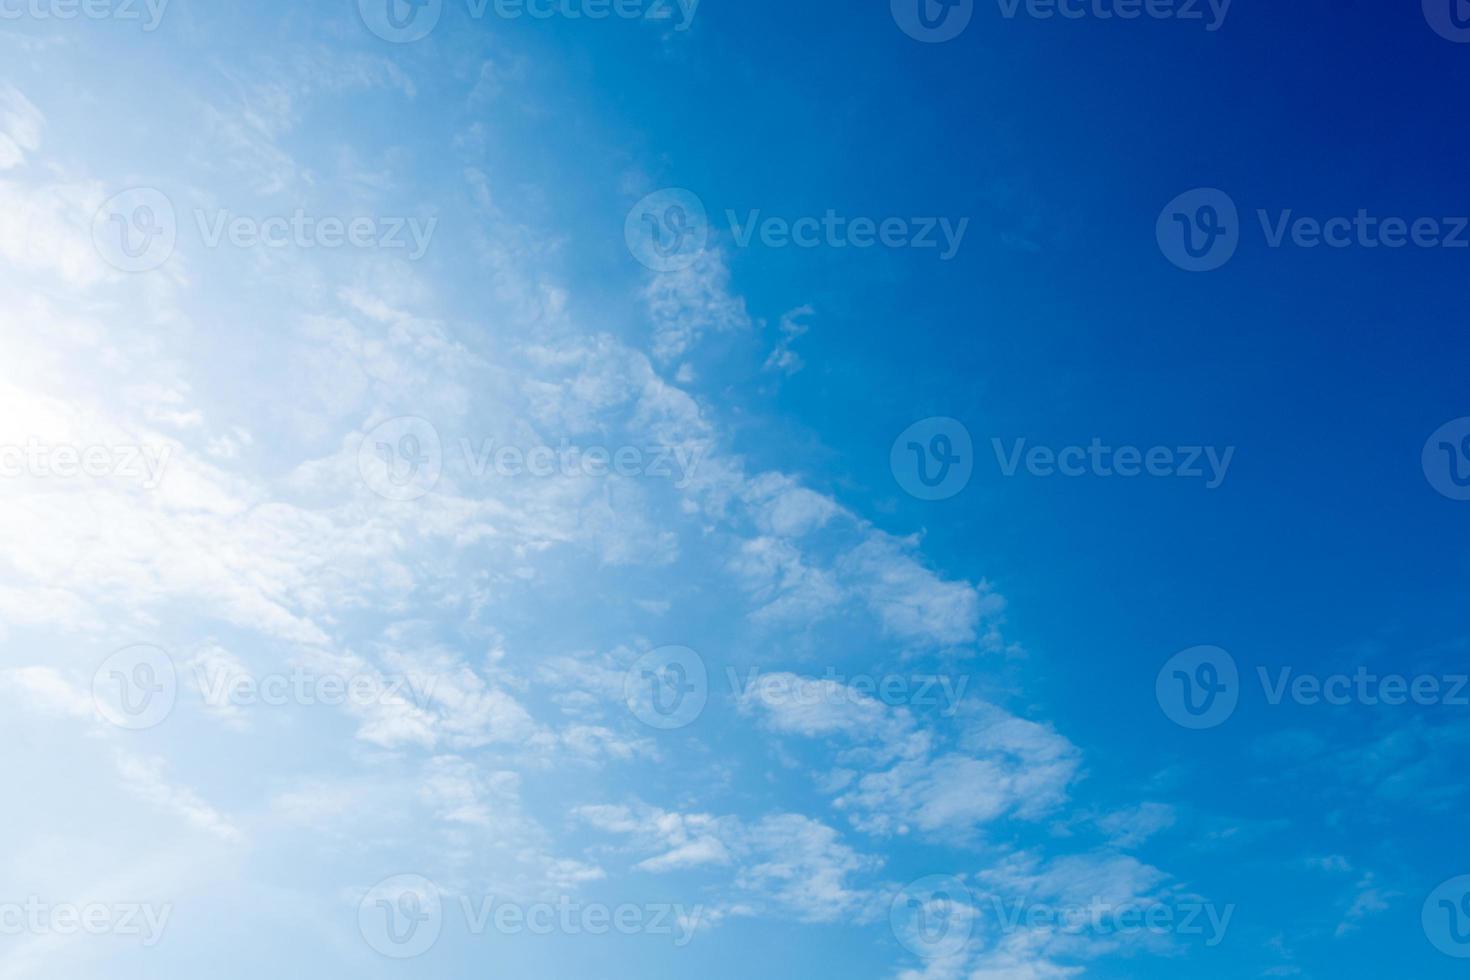 Wolken am blauen Himmel foto